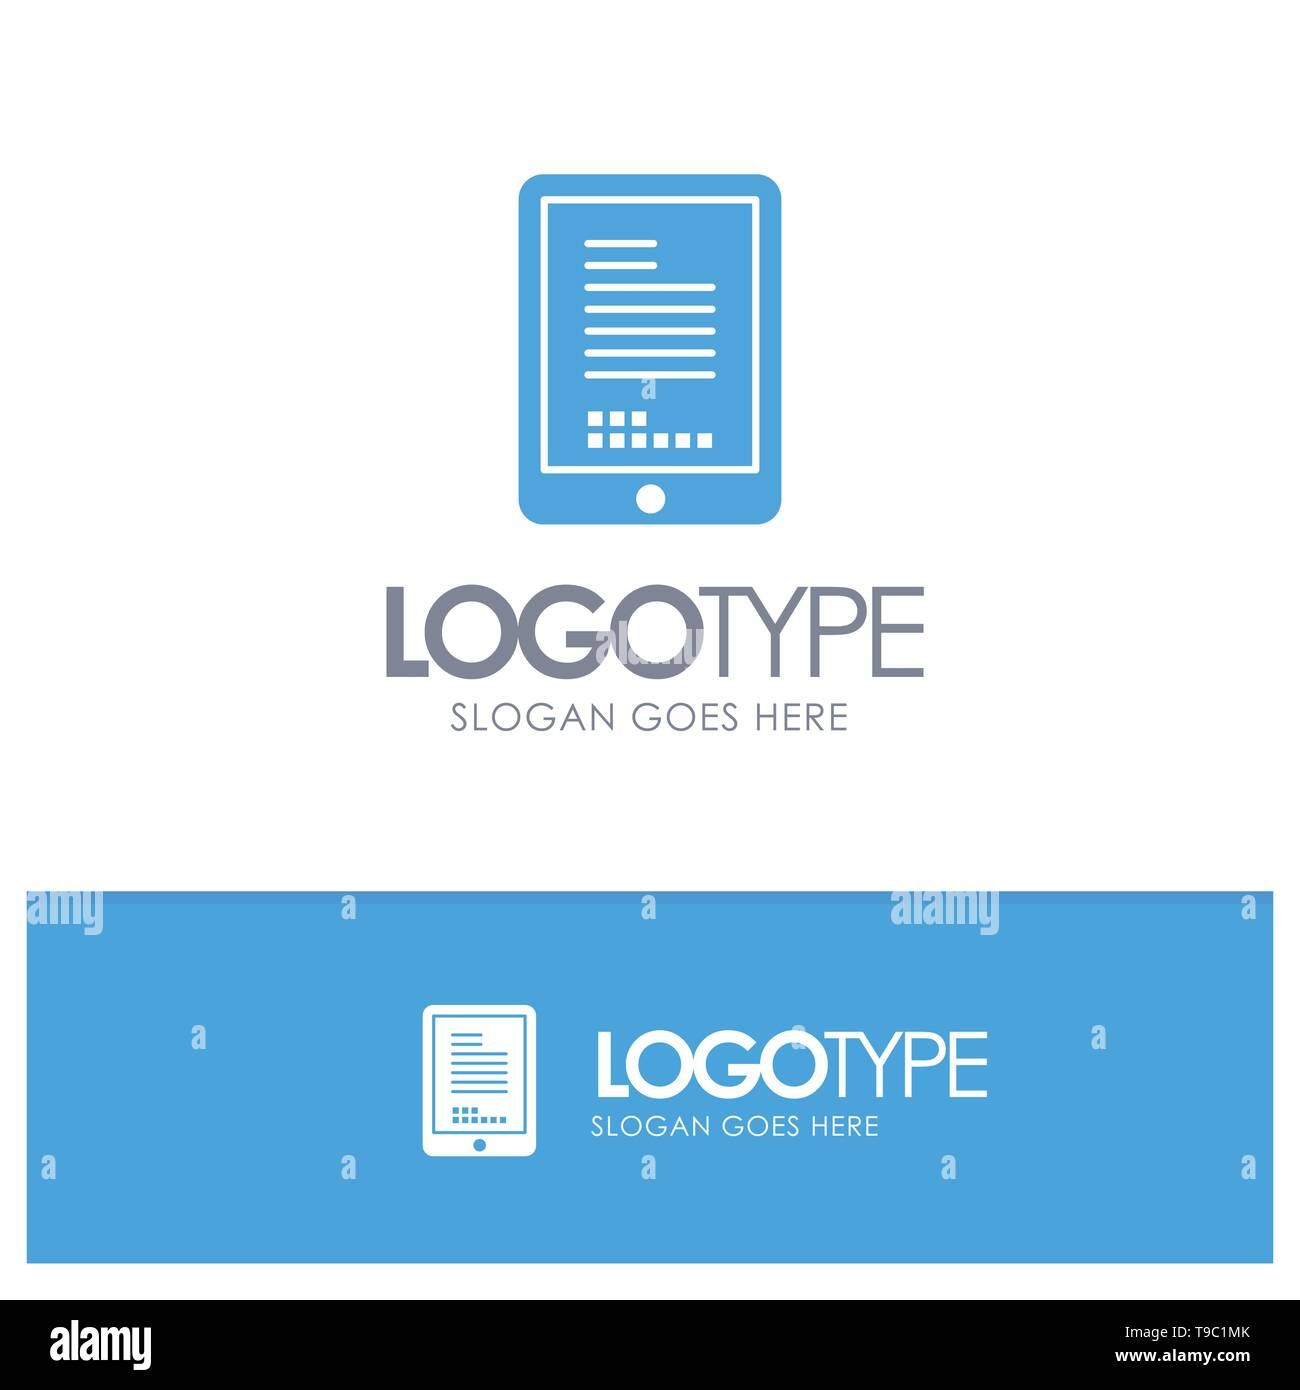 Mobile, Coding, Hardware, Cell Blue Logo vector - Stock Image